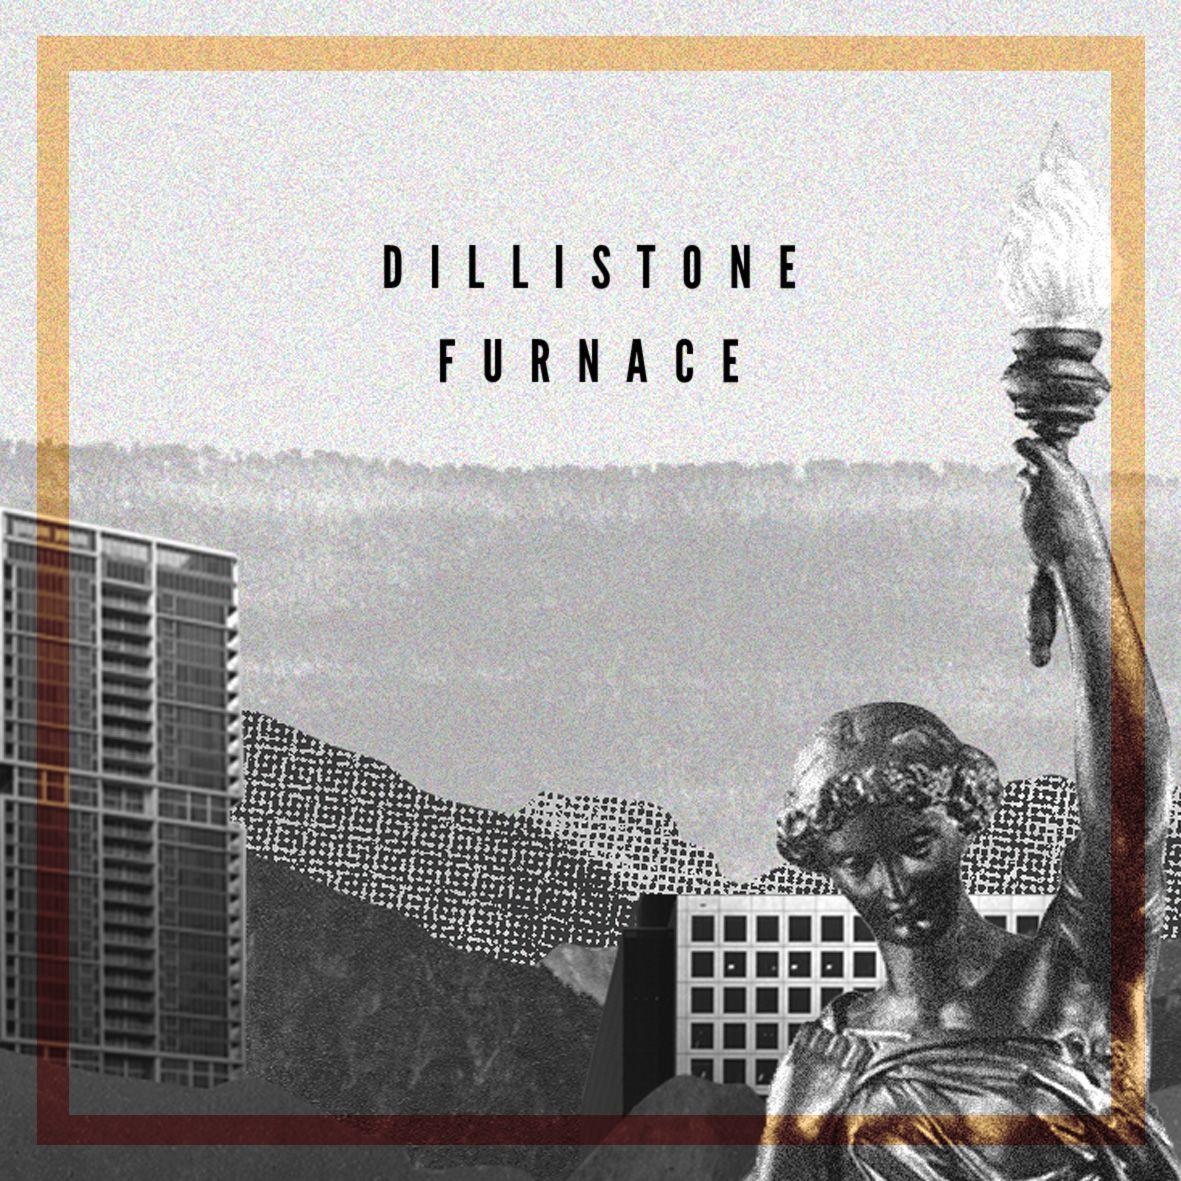 dillistone_final01.jpg